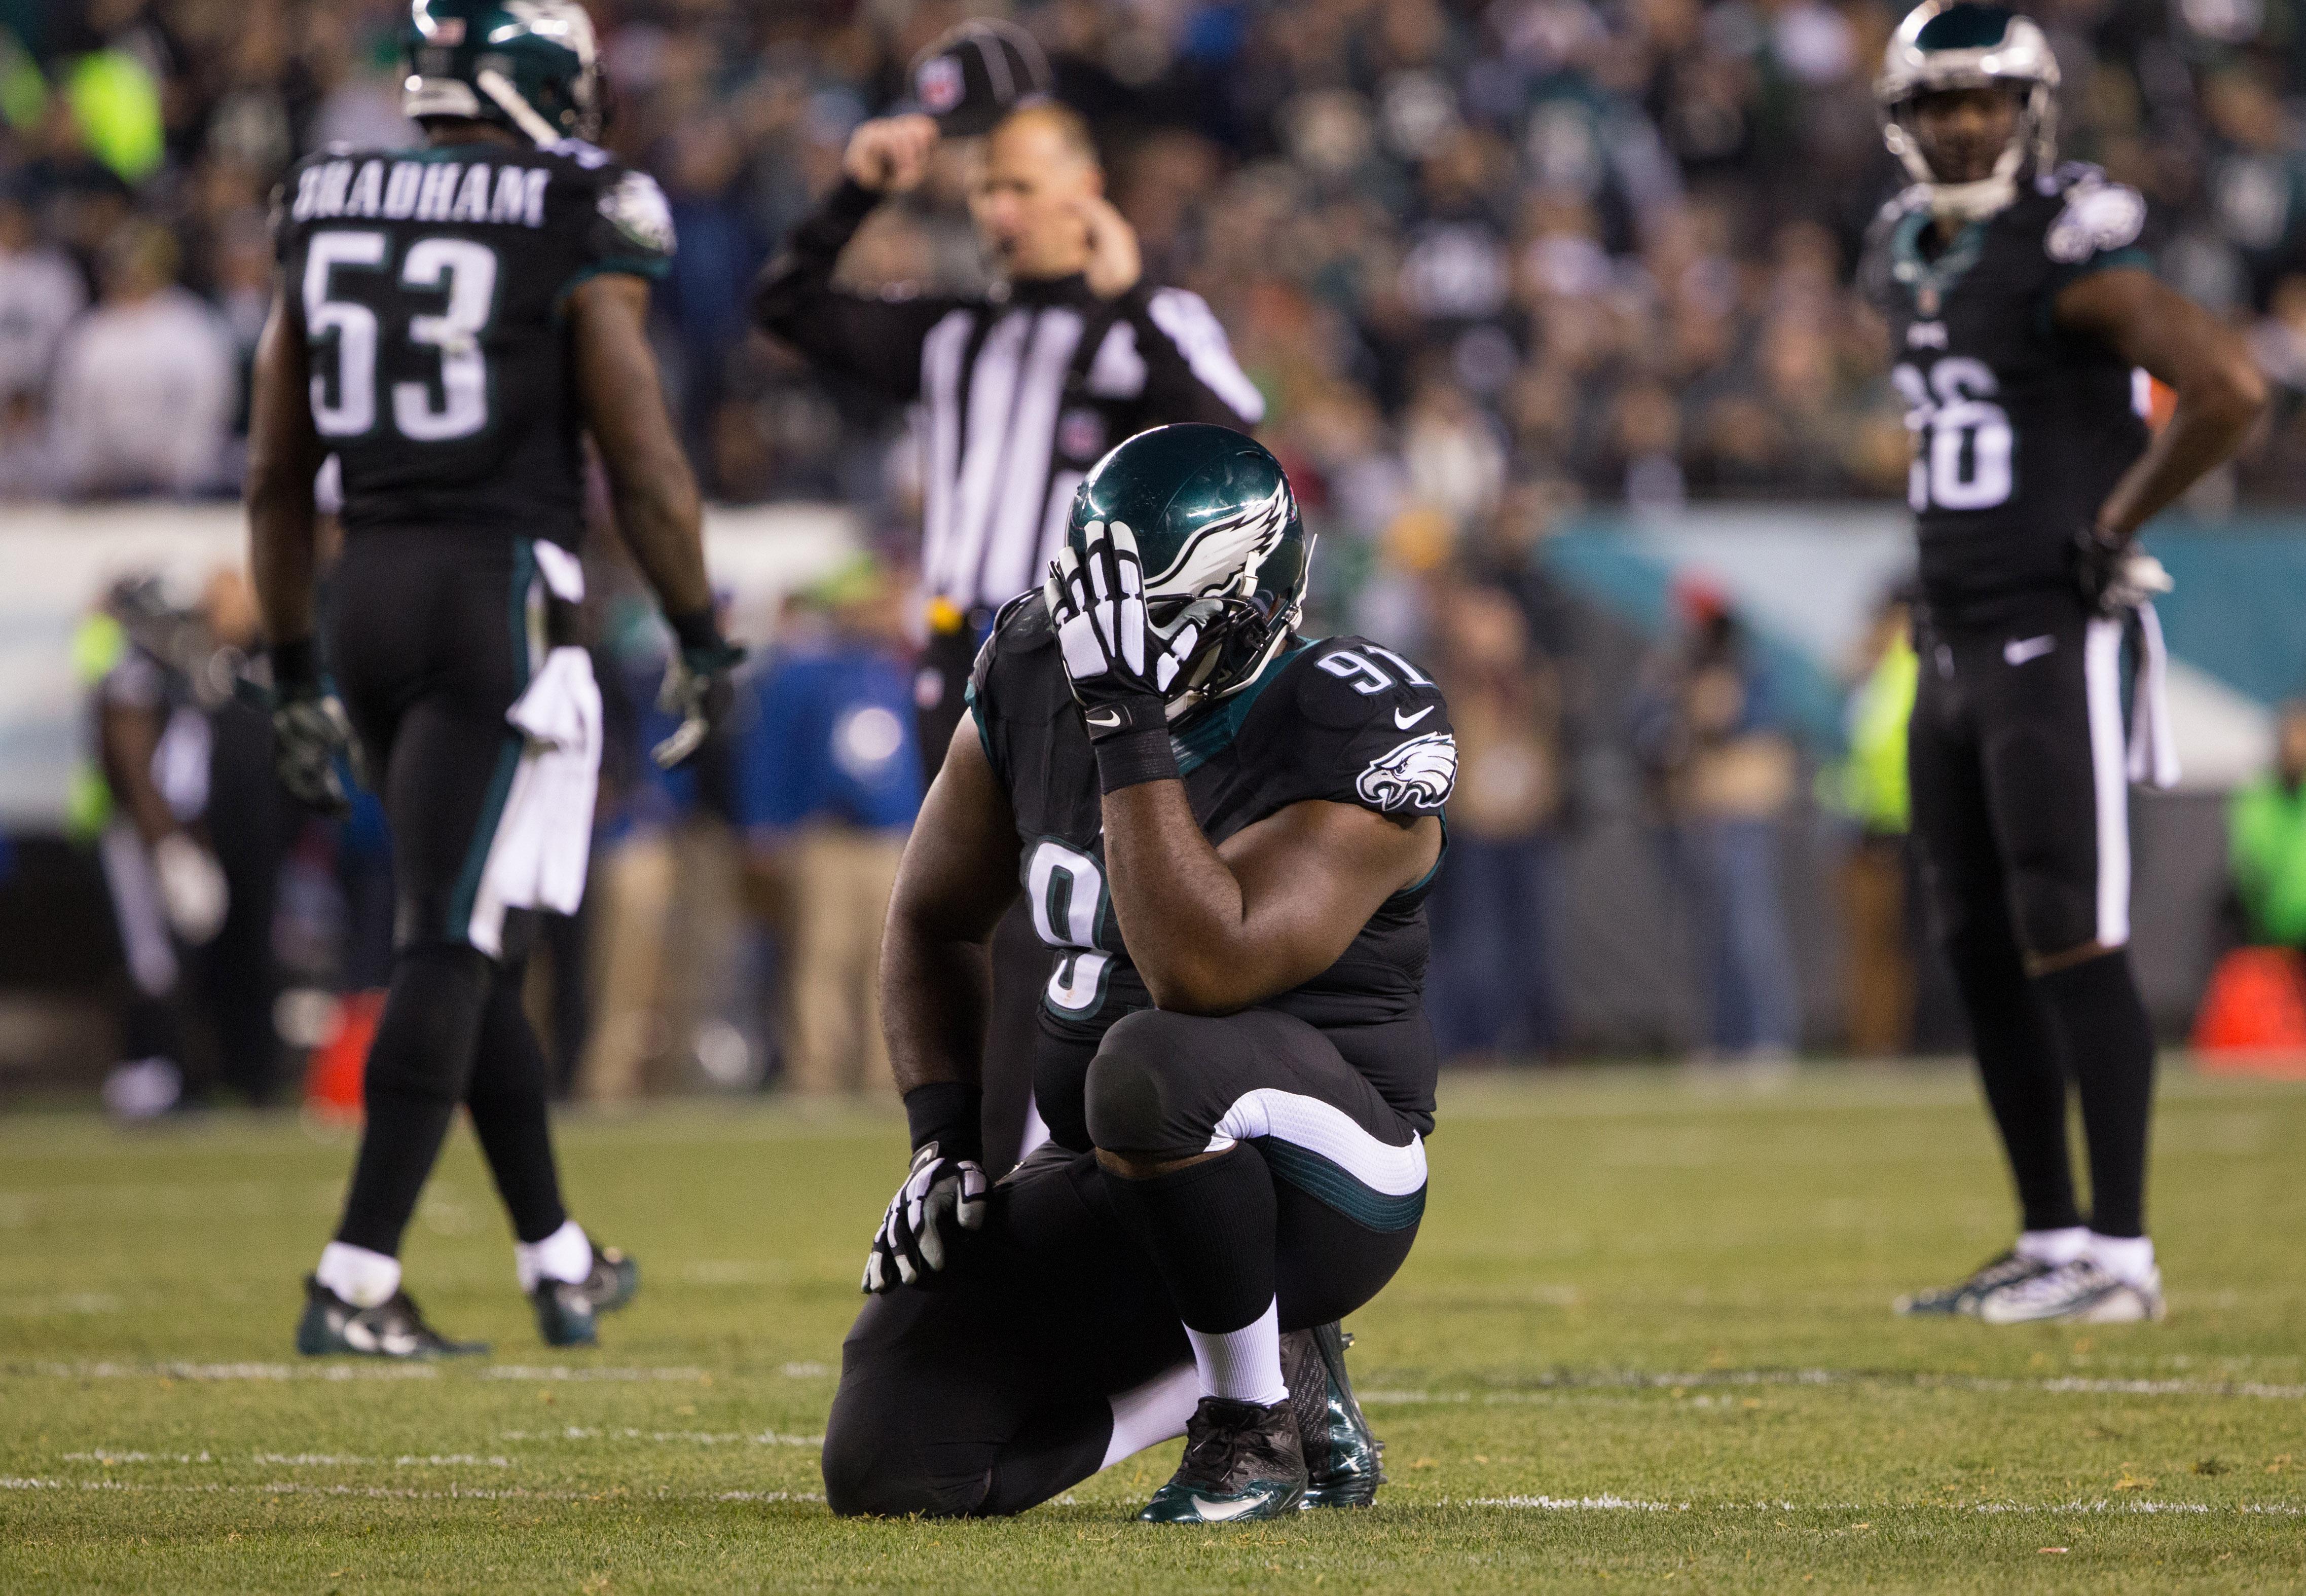 Philadelphia Eagles: Fletcher Cox setting a bad example